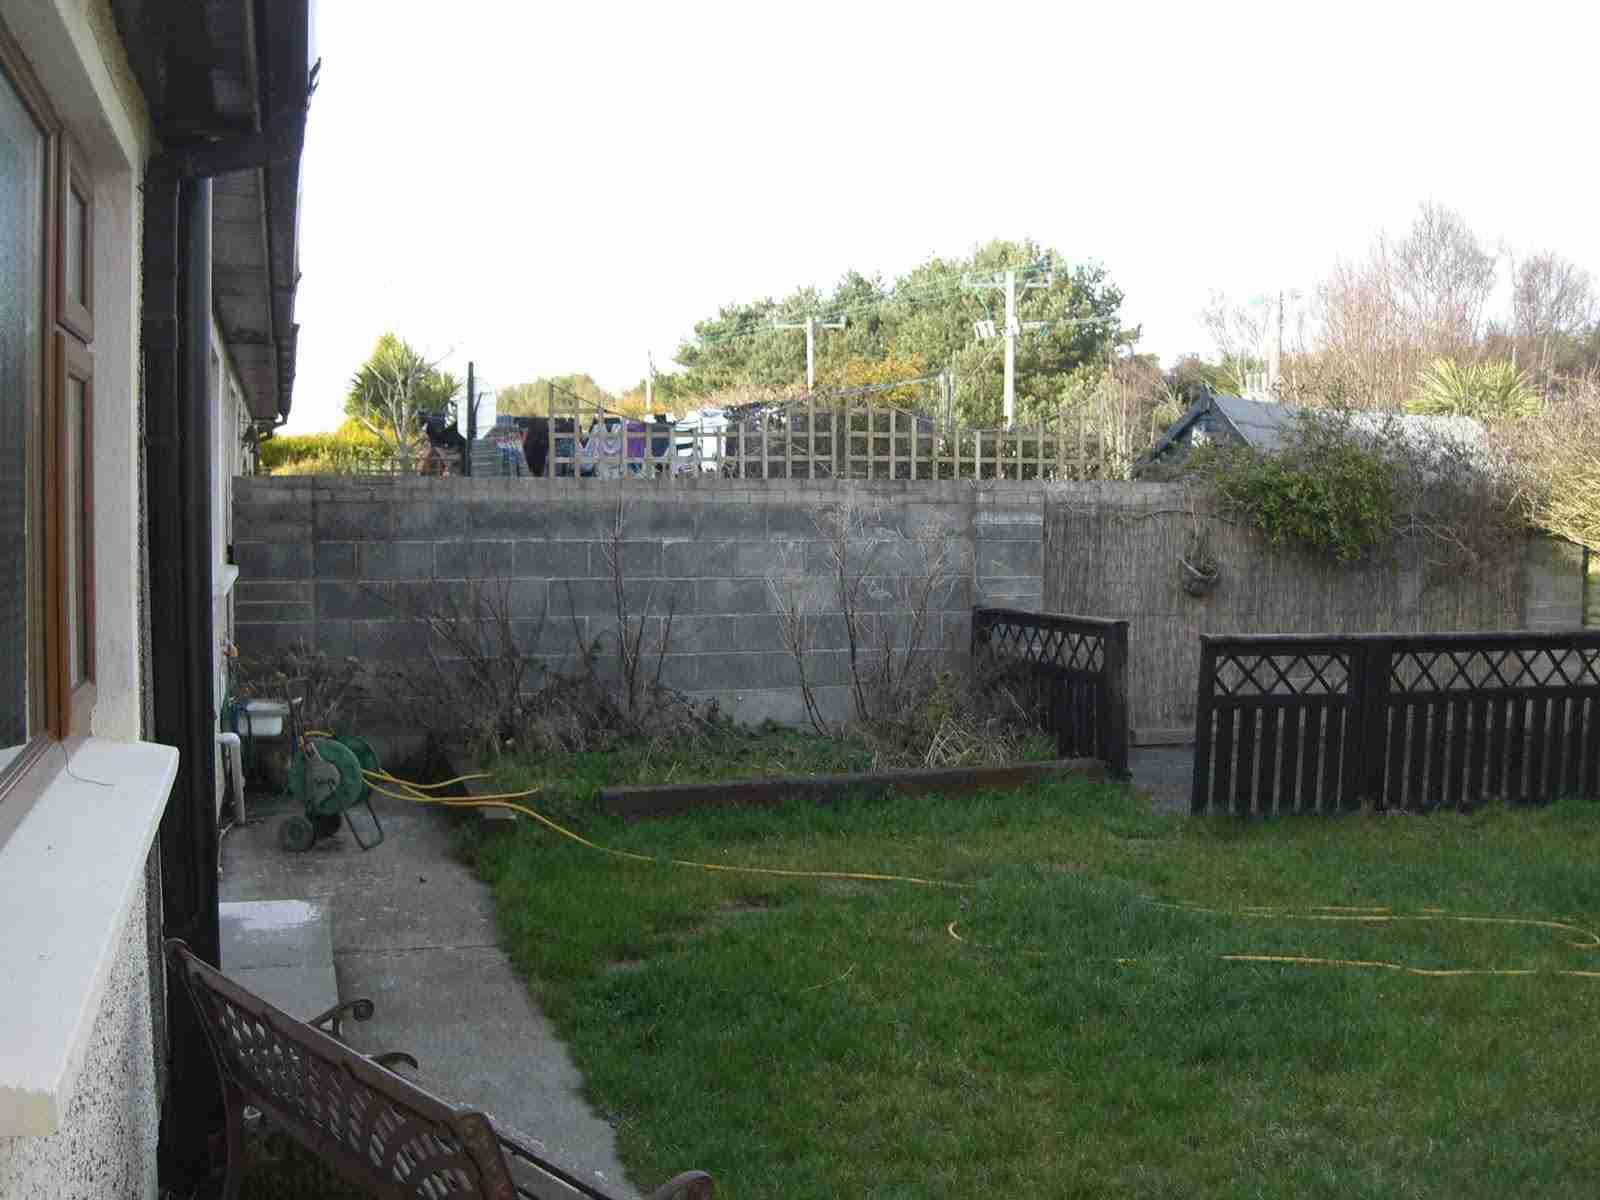 Garden design,driveway paved, Mornington Towers,Mornington ...